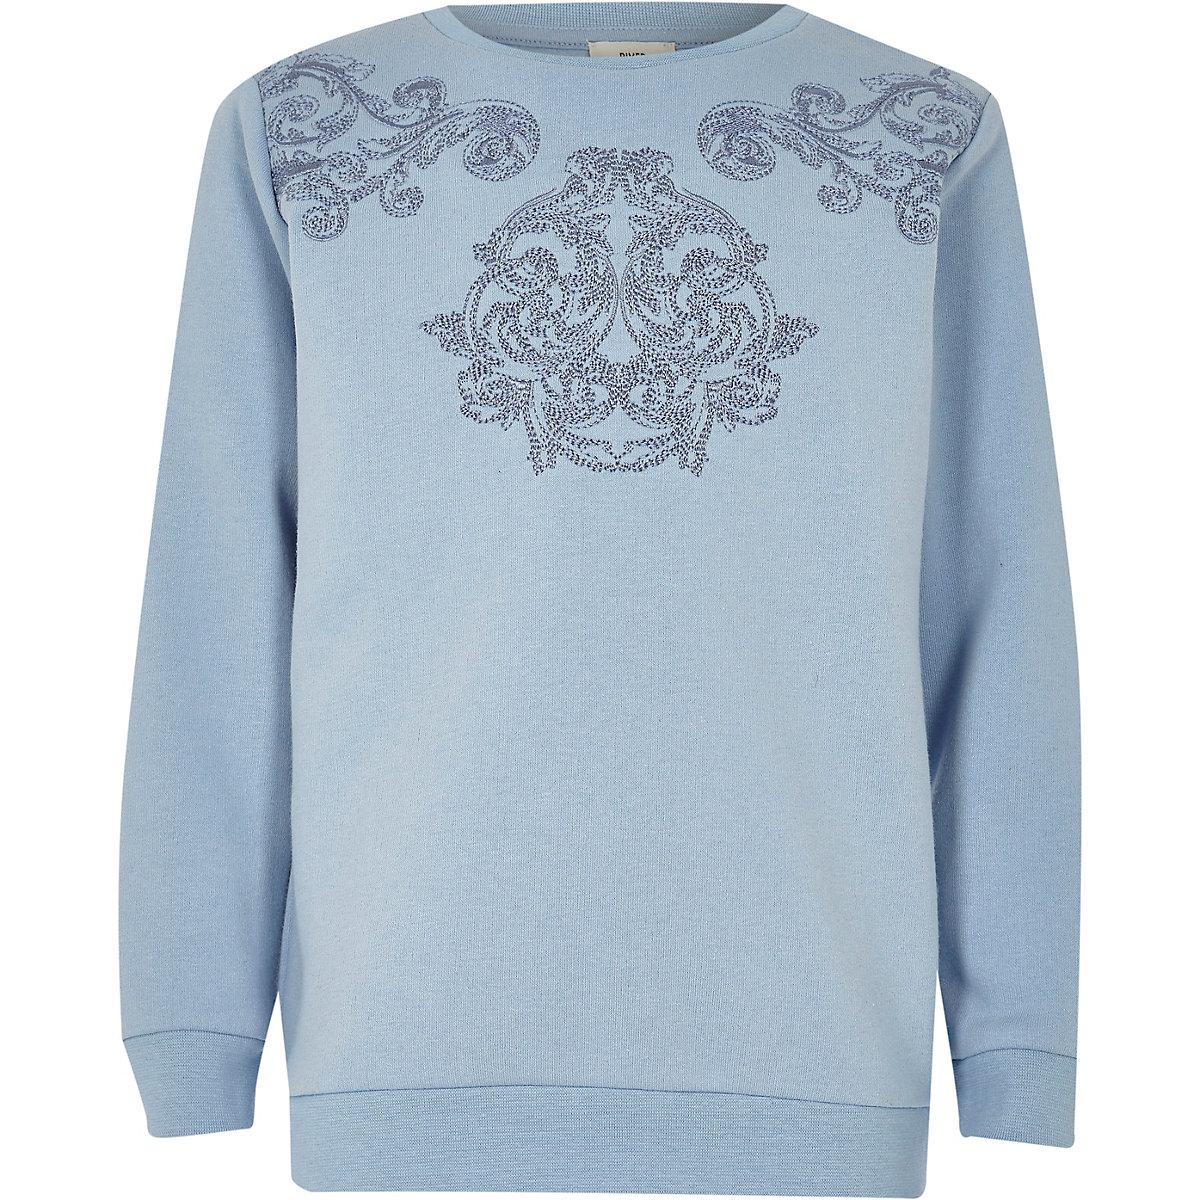 Boys blue embroidered sweatshirt